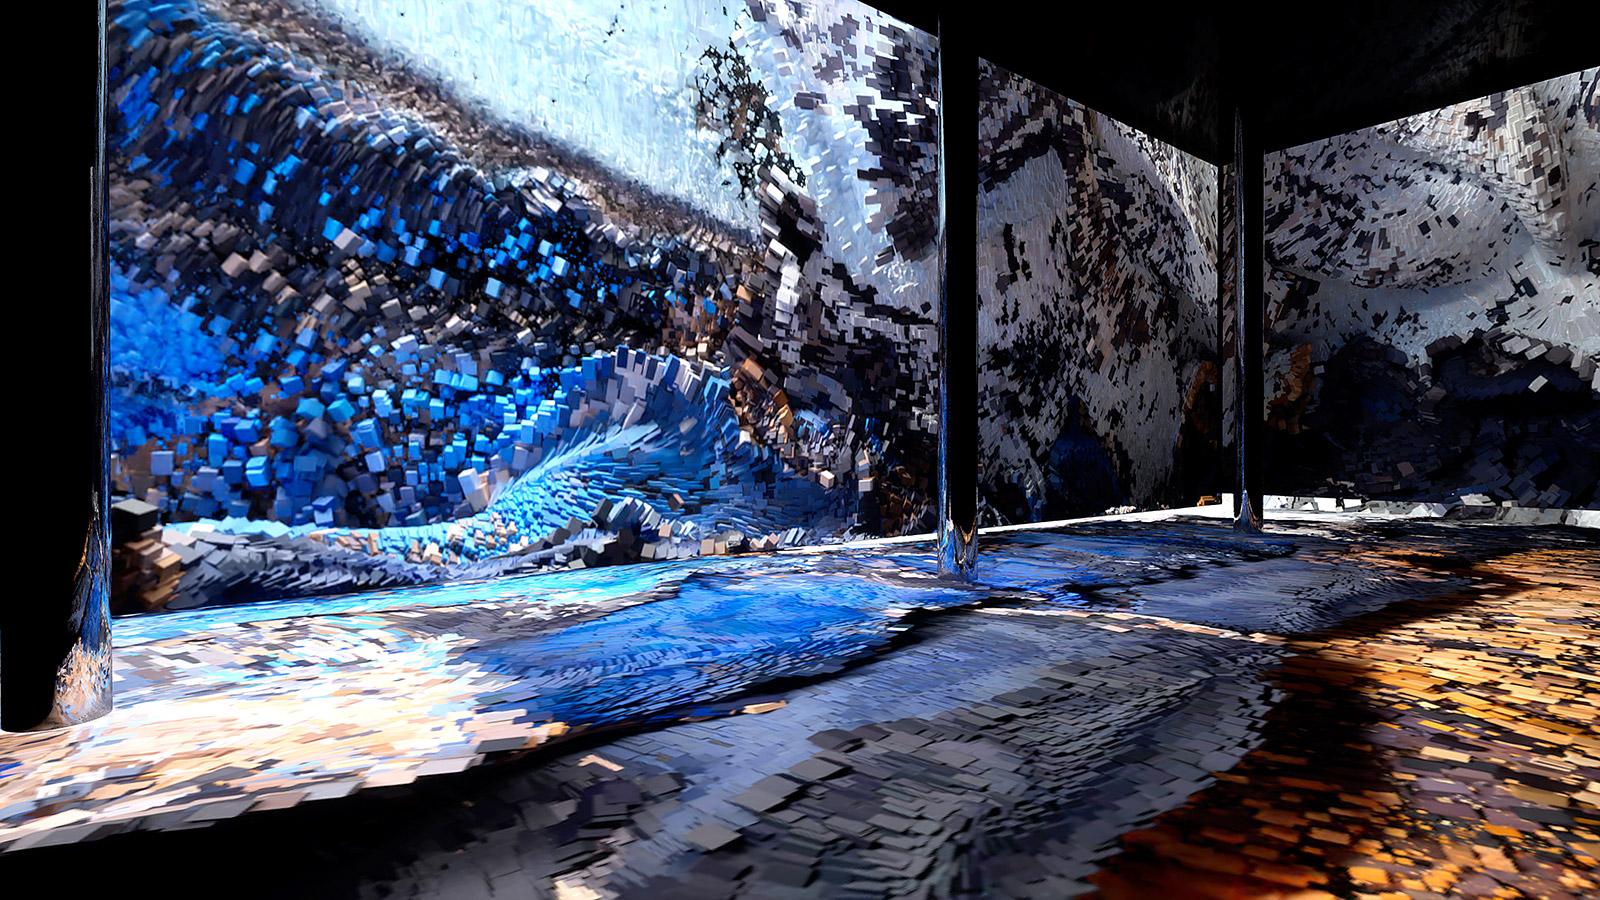 Artechouse is New York's first permanent digital art gallery